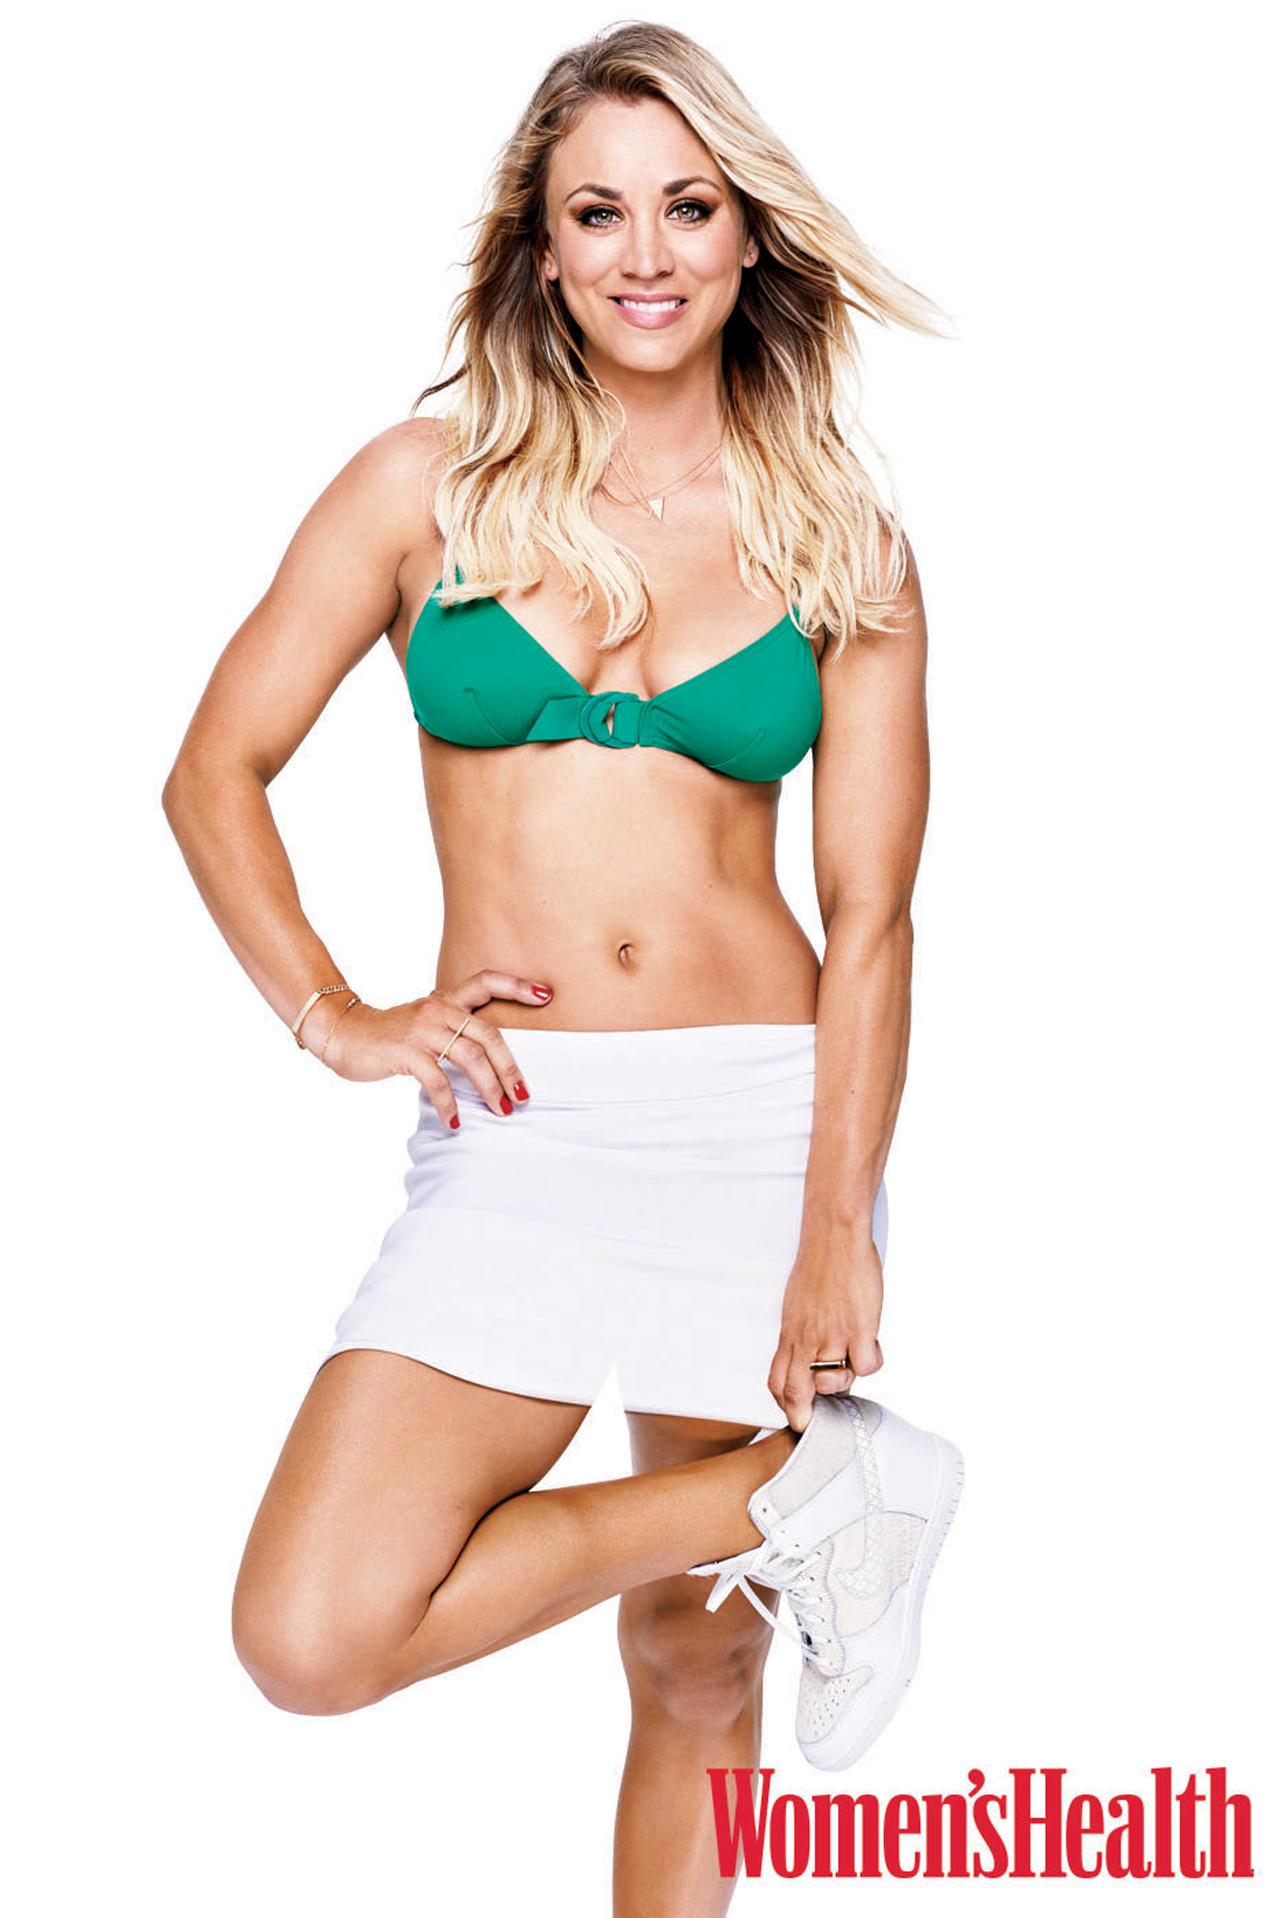 Kaley Cuoco [Women's Health]